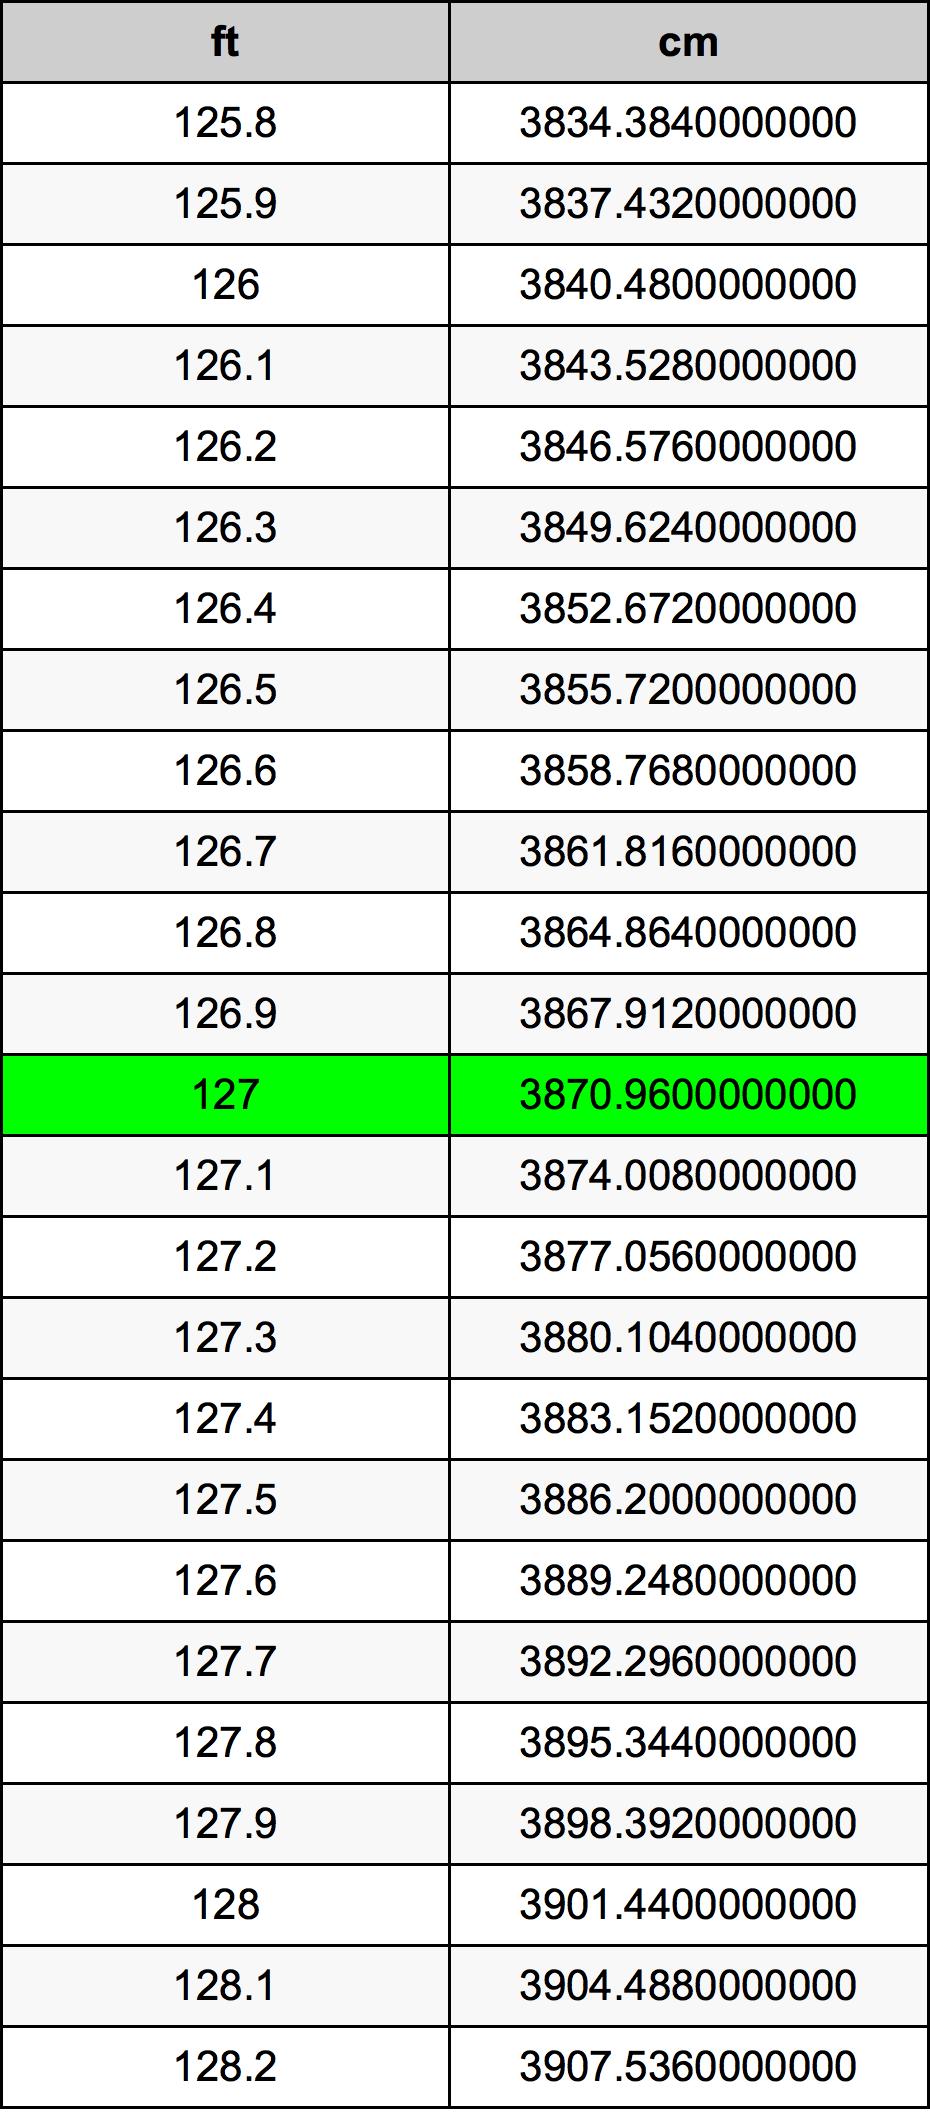 127 Feet To Centimeters Converter   127 ft To cm Converter